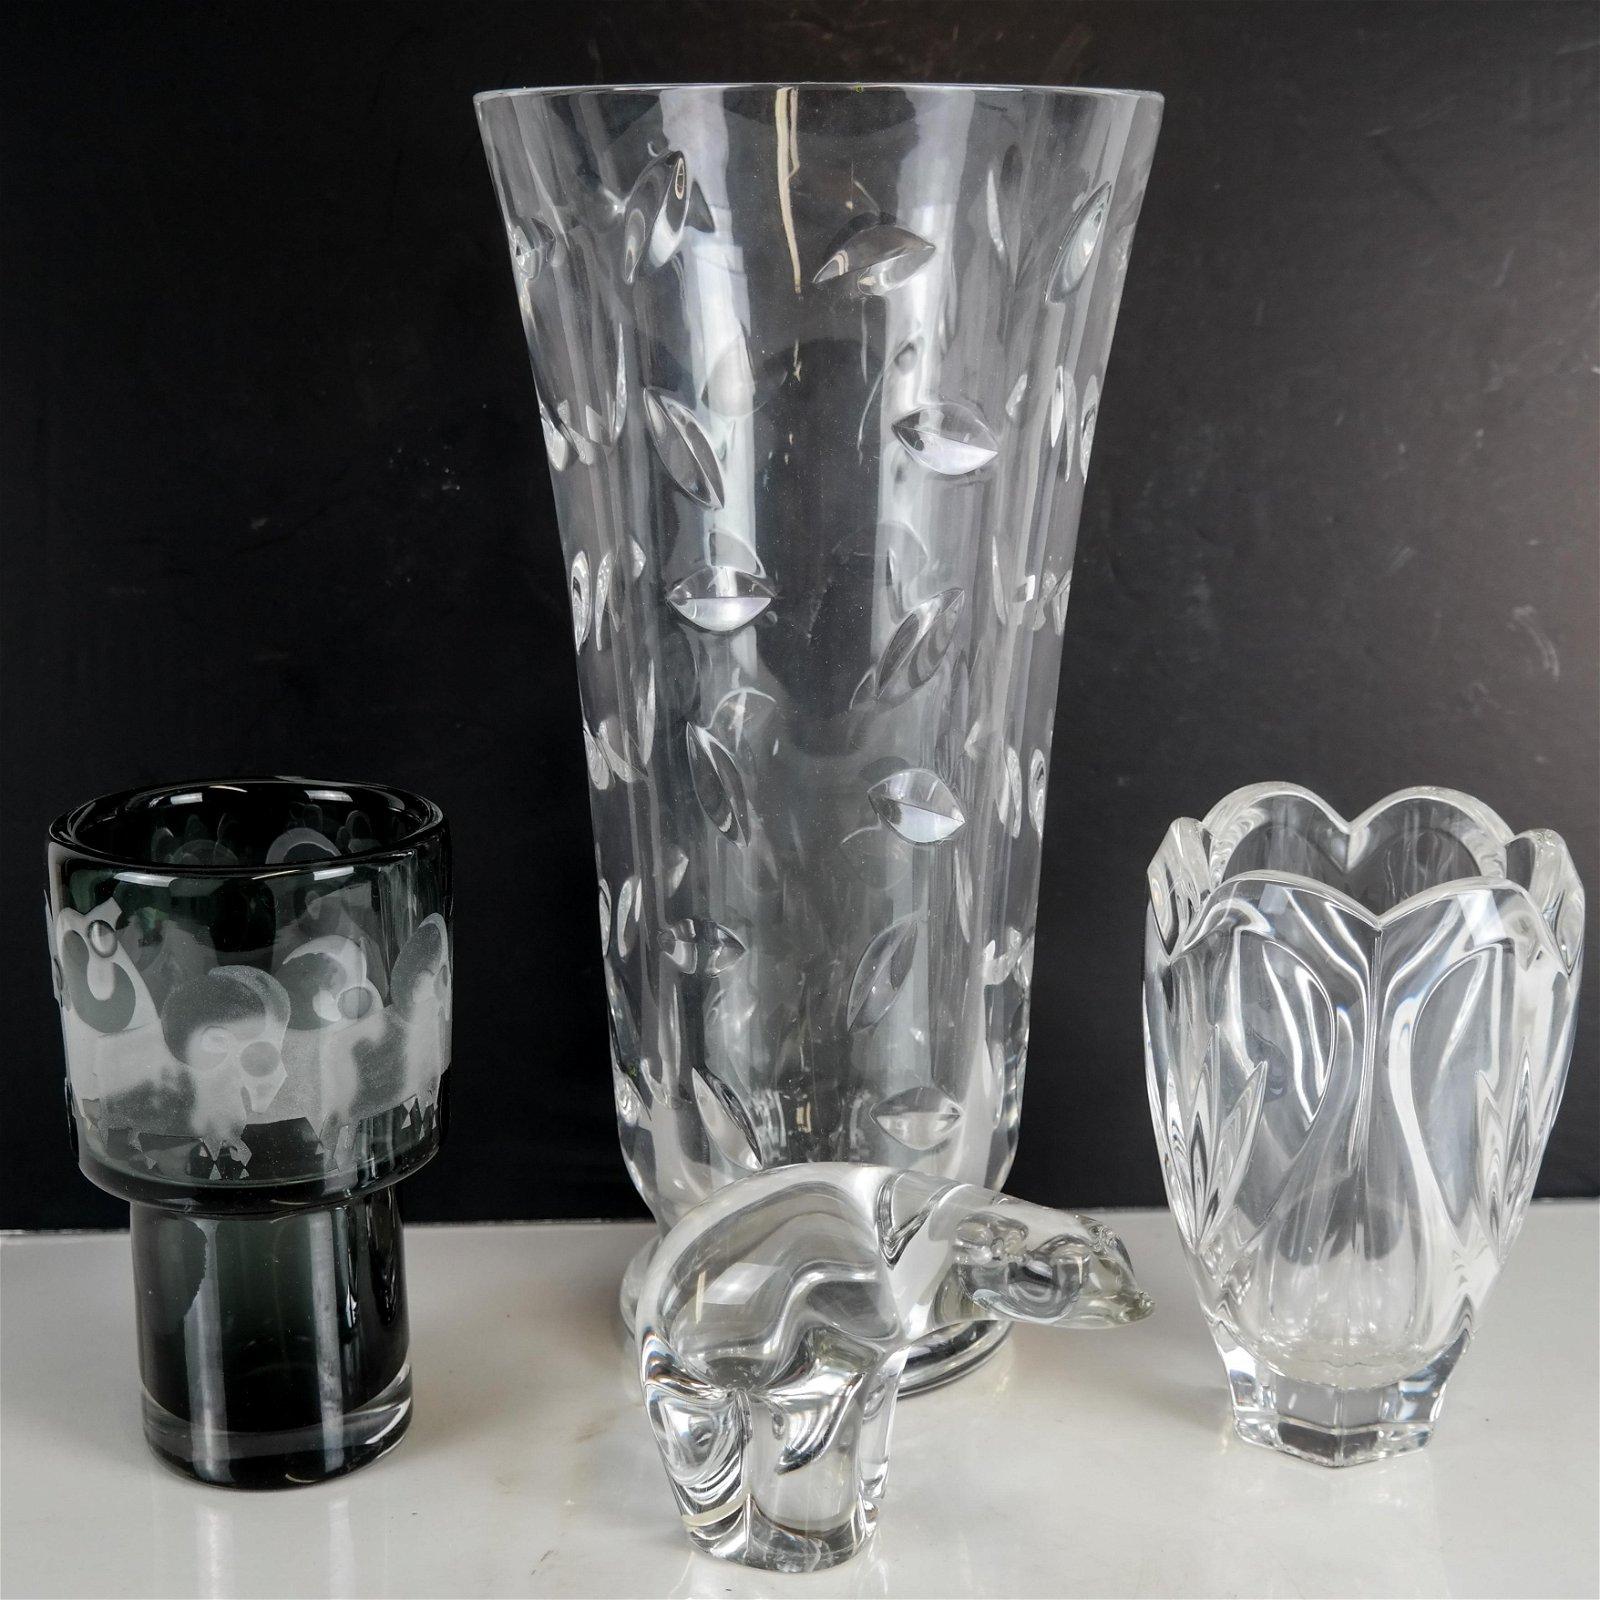 Tiffany, Kosta, Wedgwood, Waterford - 4 Items